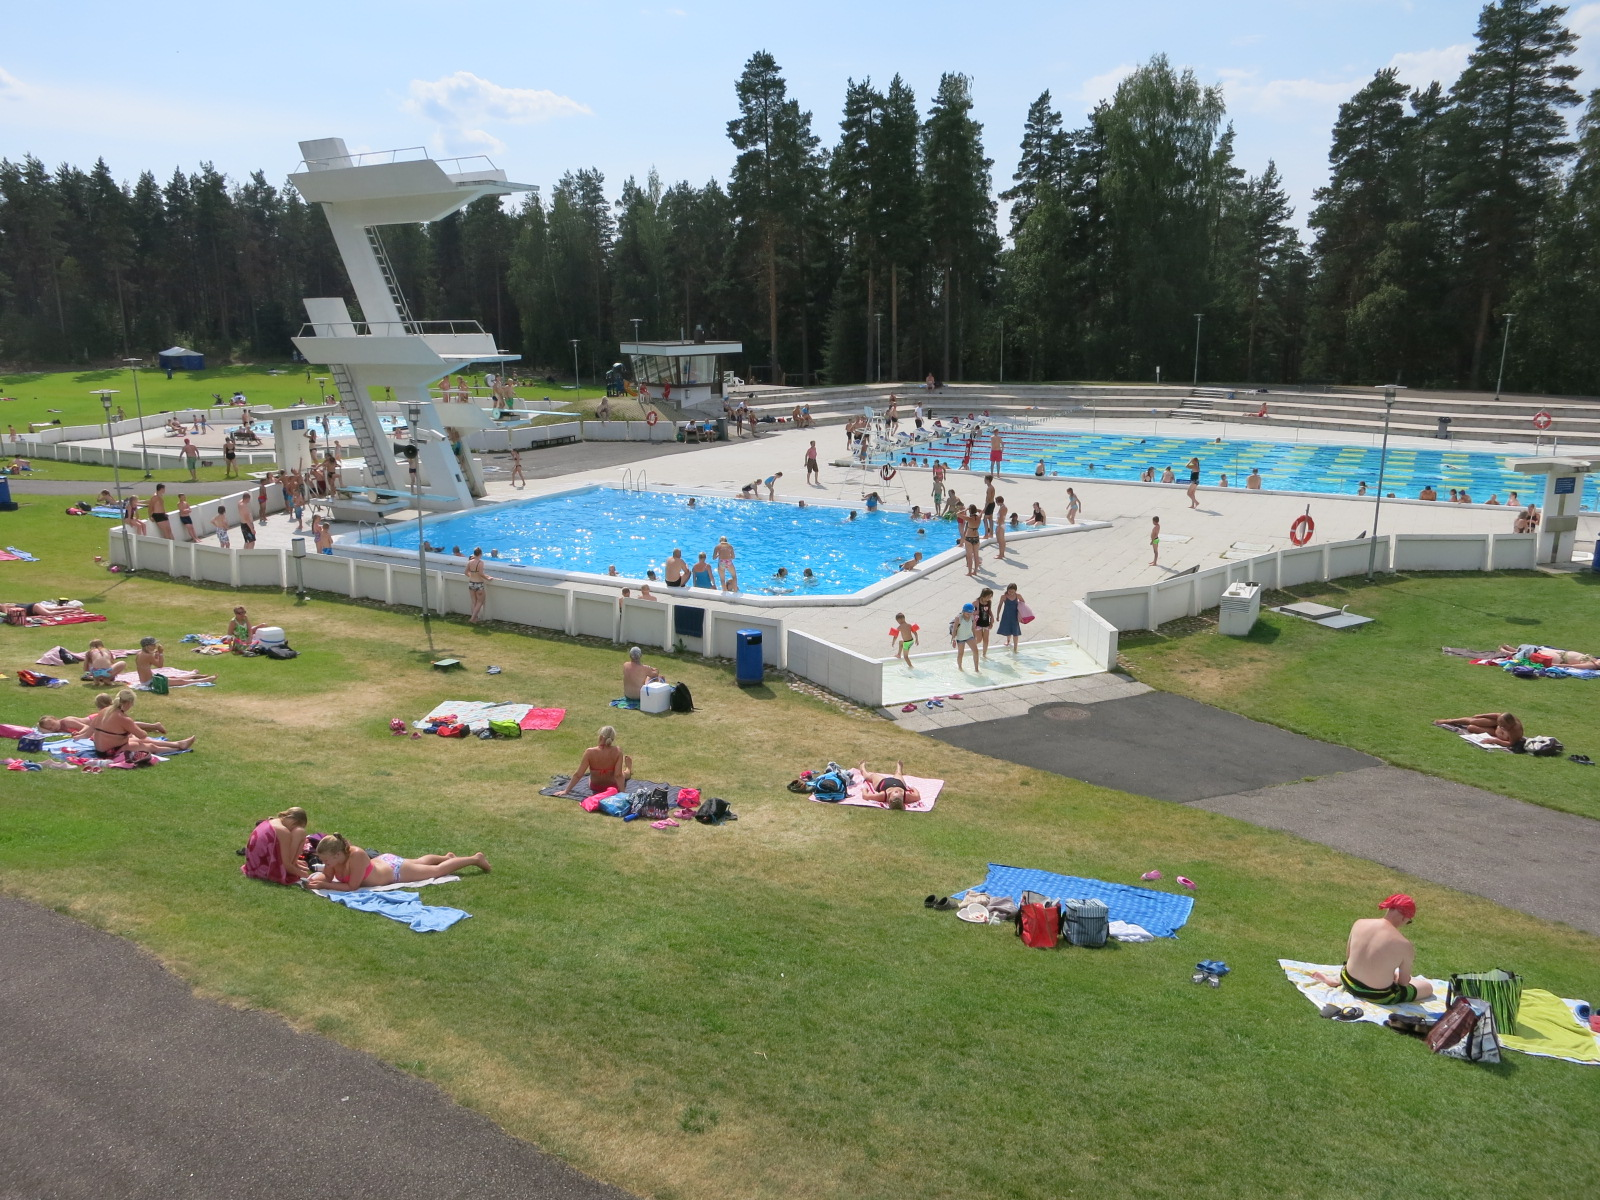 File:Sveitsi outdoor swimming pools.JPG - Wikimedia Commons